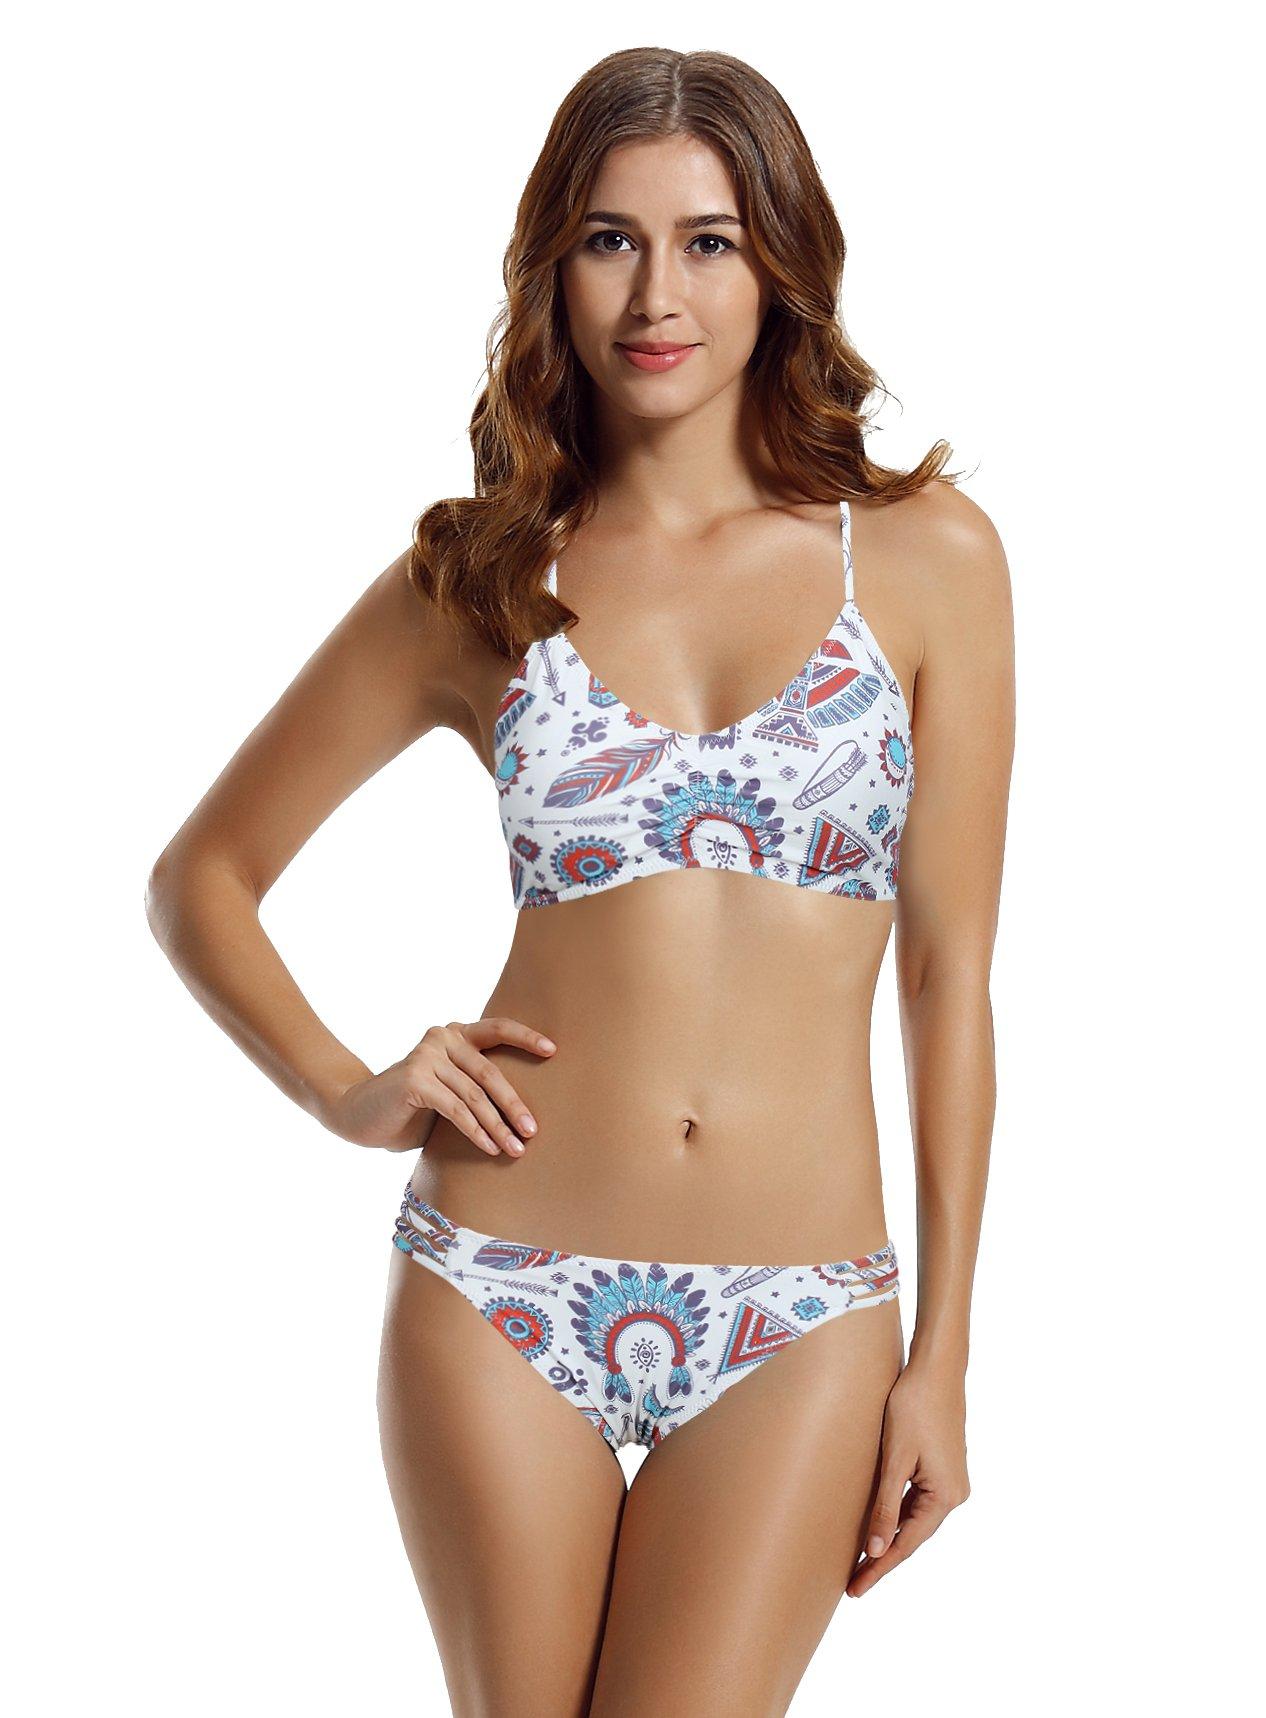 zeraca Women's Strap Side Bottom Halter Racerback Bikini Bathing Suits (FBA) (Small / 6, Symbol)